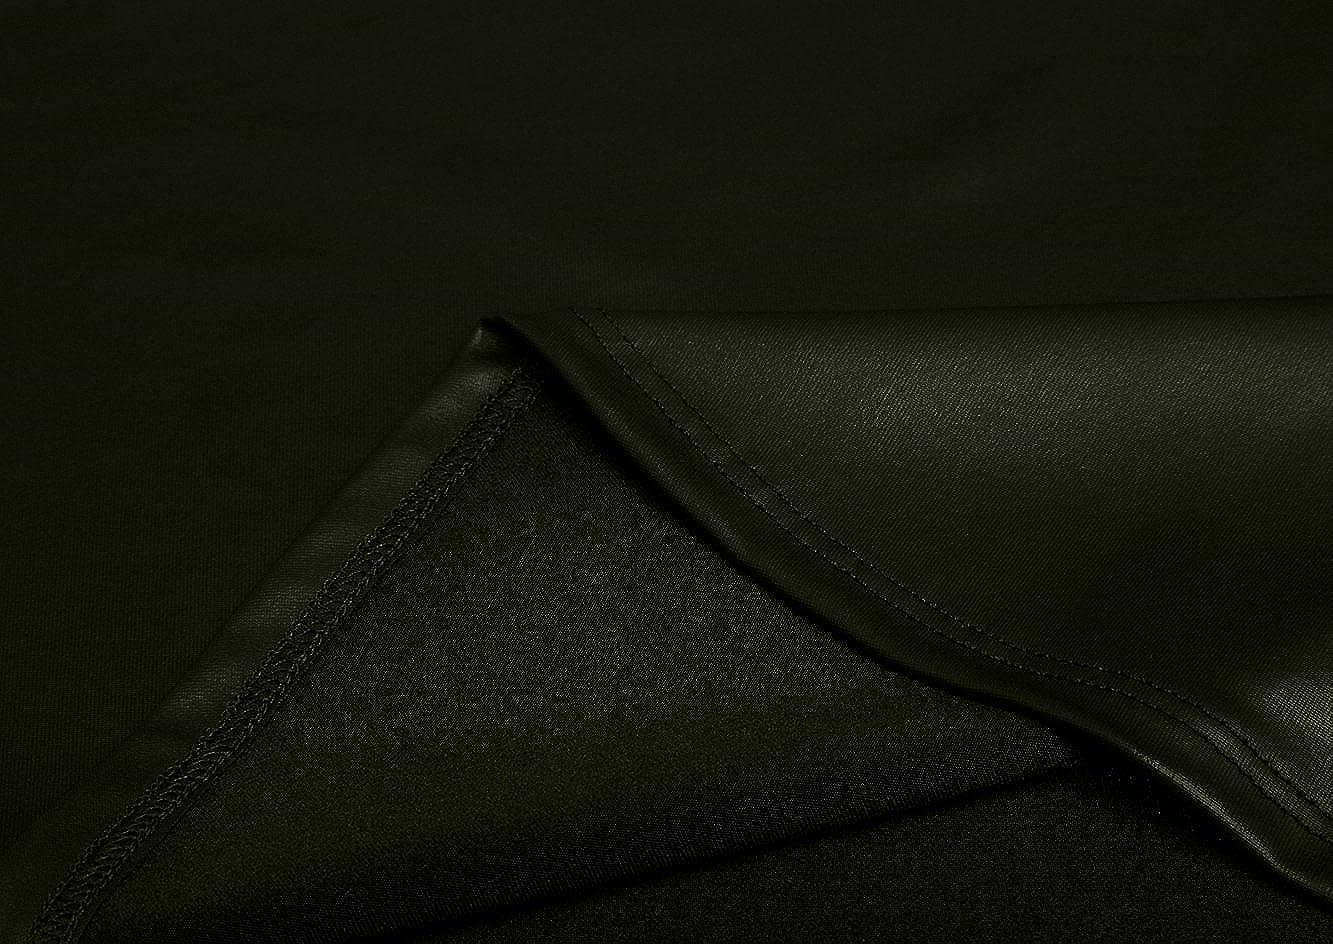 Womens Faux Leather Skater Skirt Short a Line Mini Skirt - Made in USA